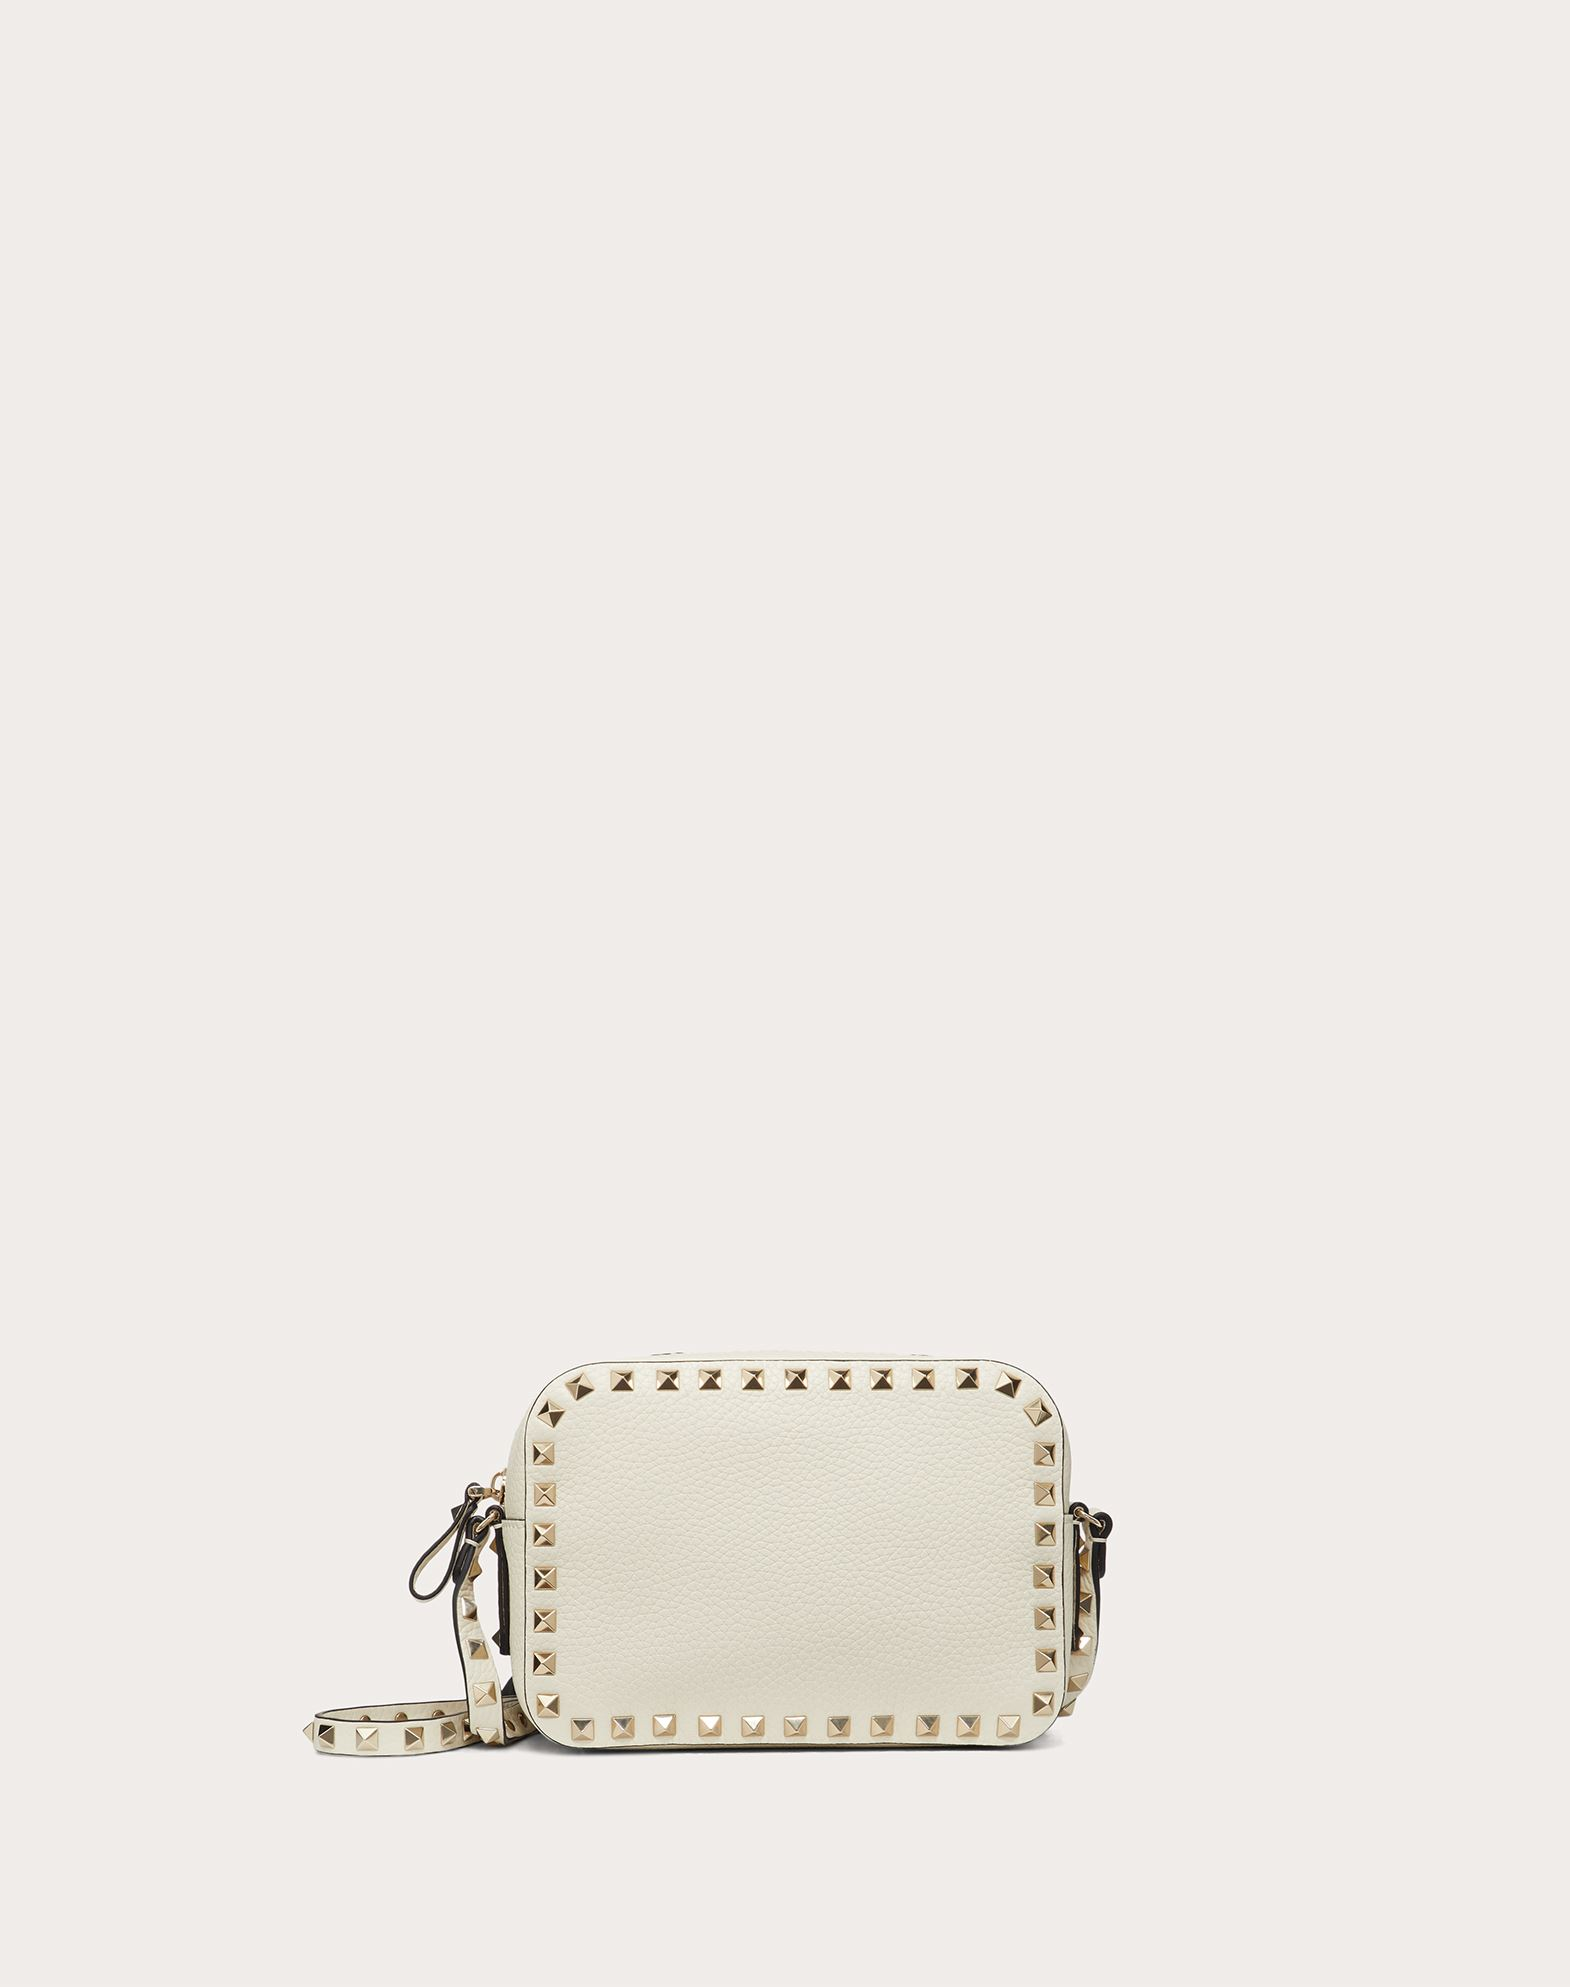 VALENTINO 铆钉 附品牌标志 单色  拉链 内部口袋 可调式背带  45333842bq